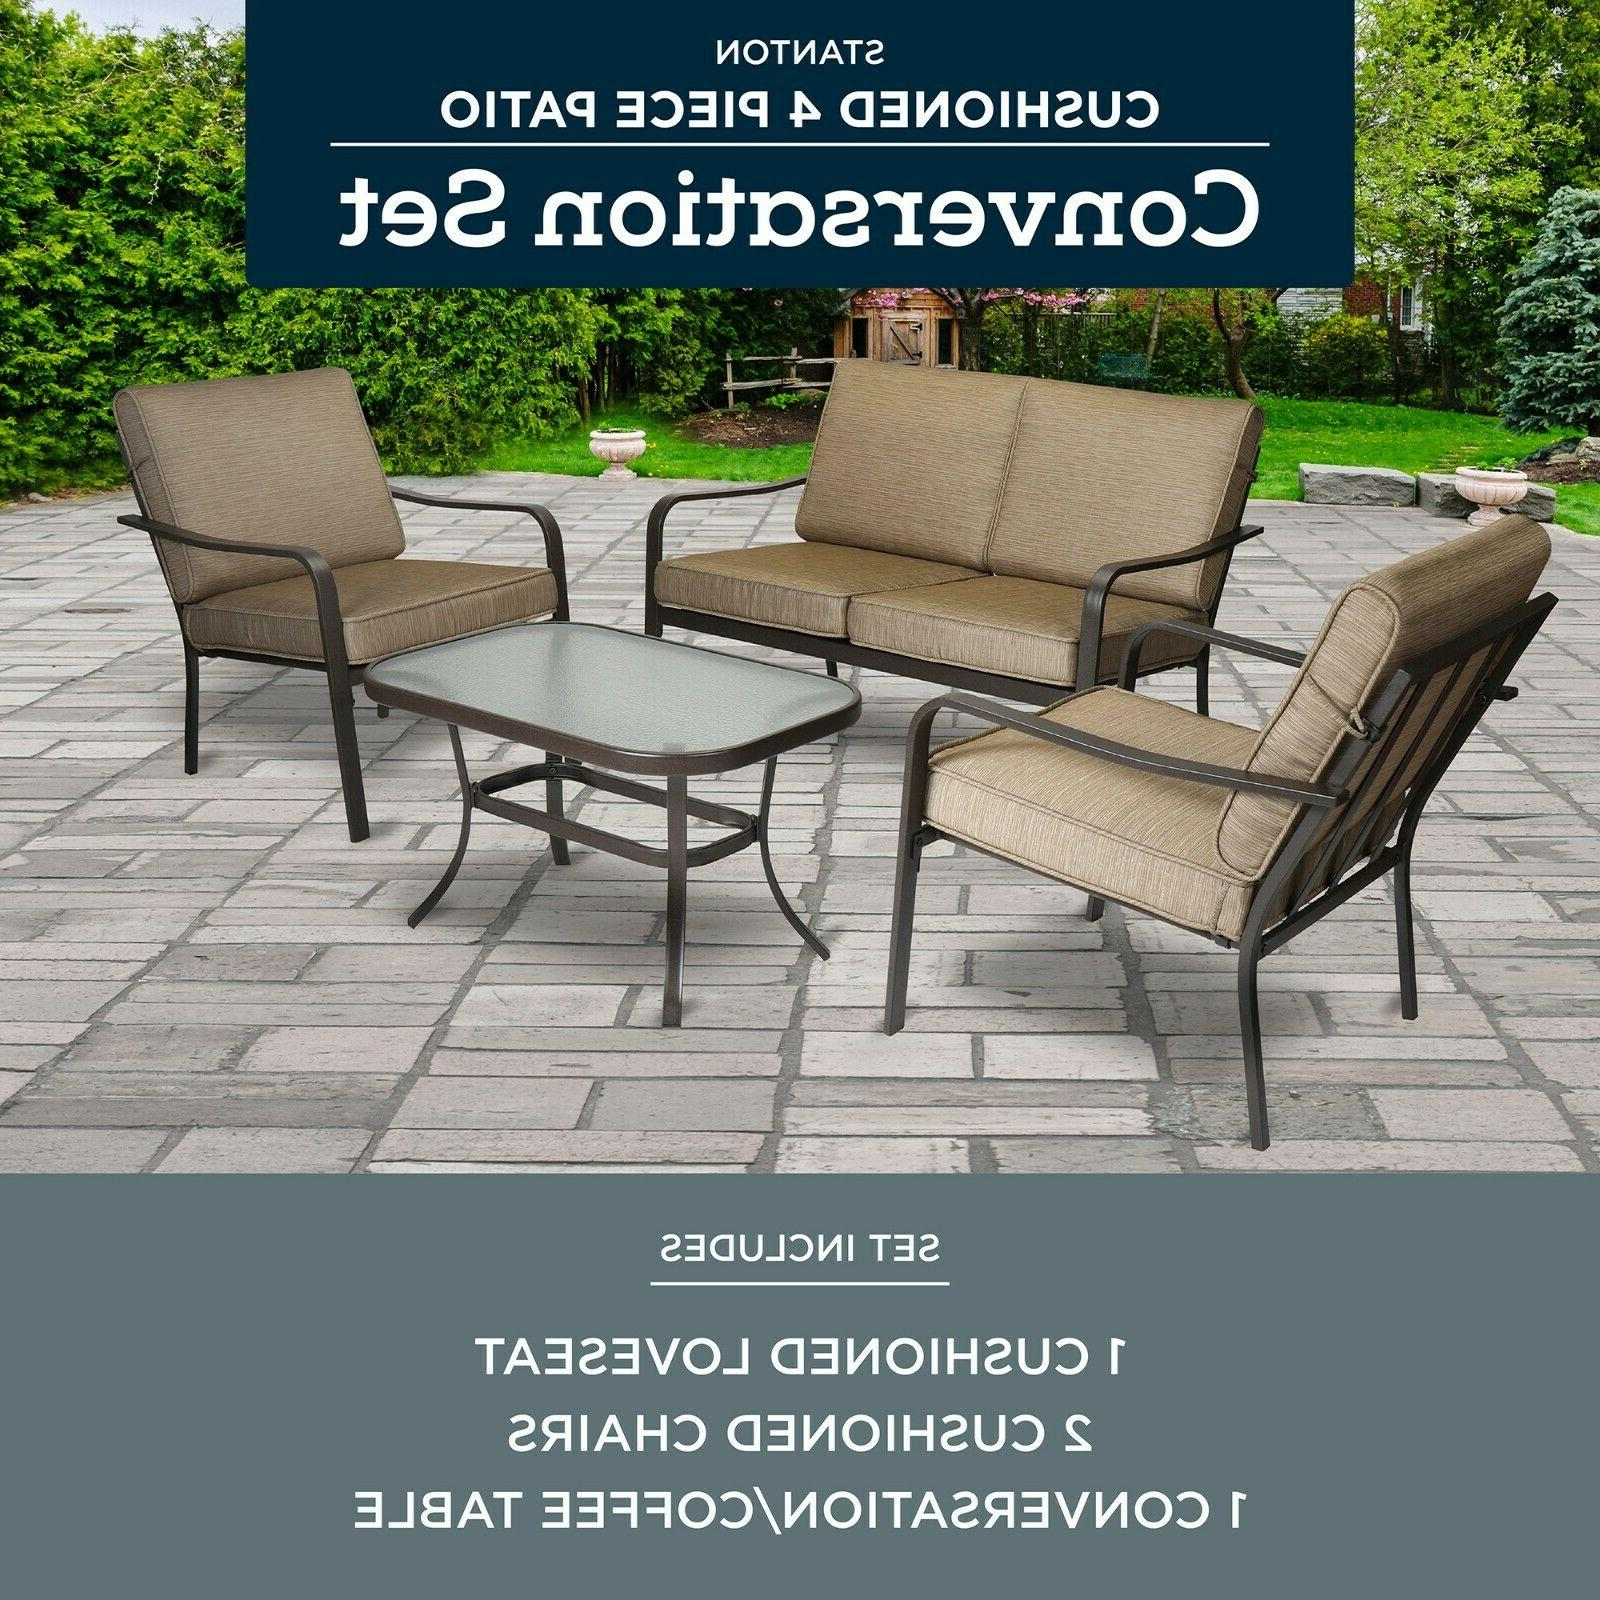 4 piece patio furniture conversation set brown